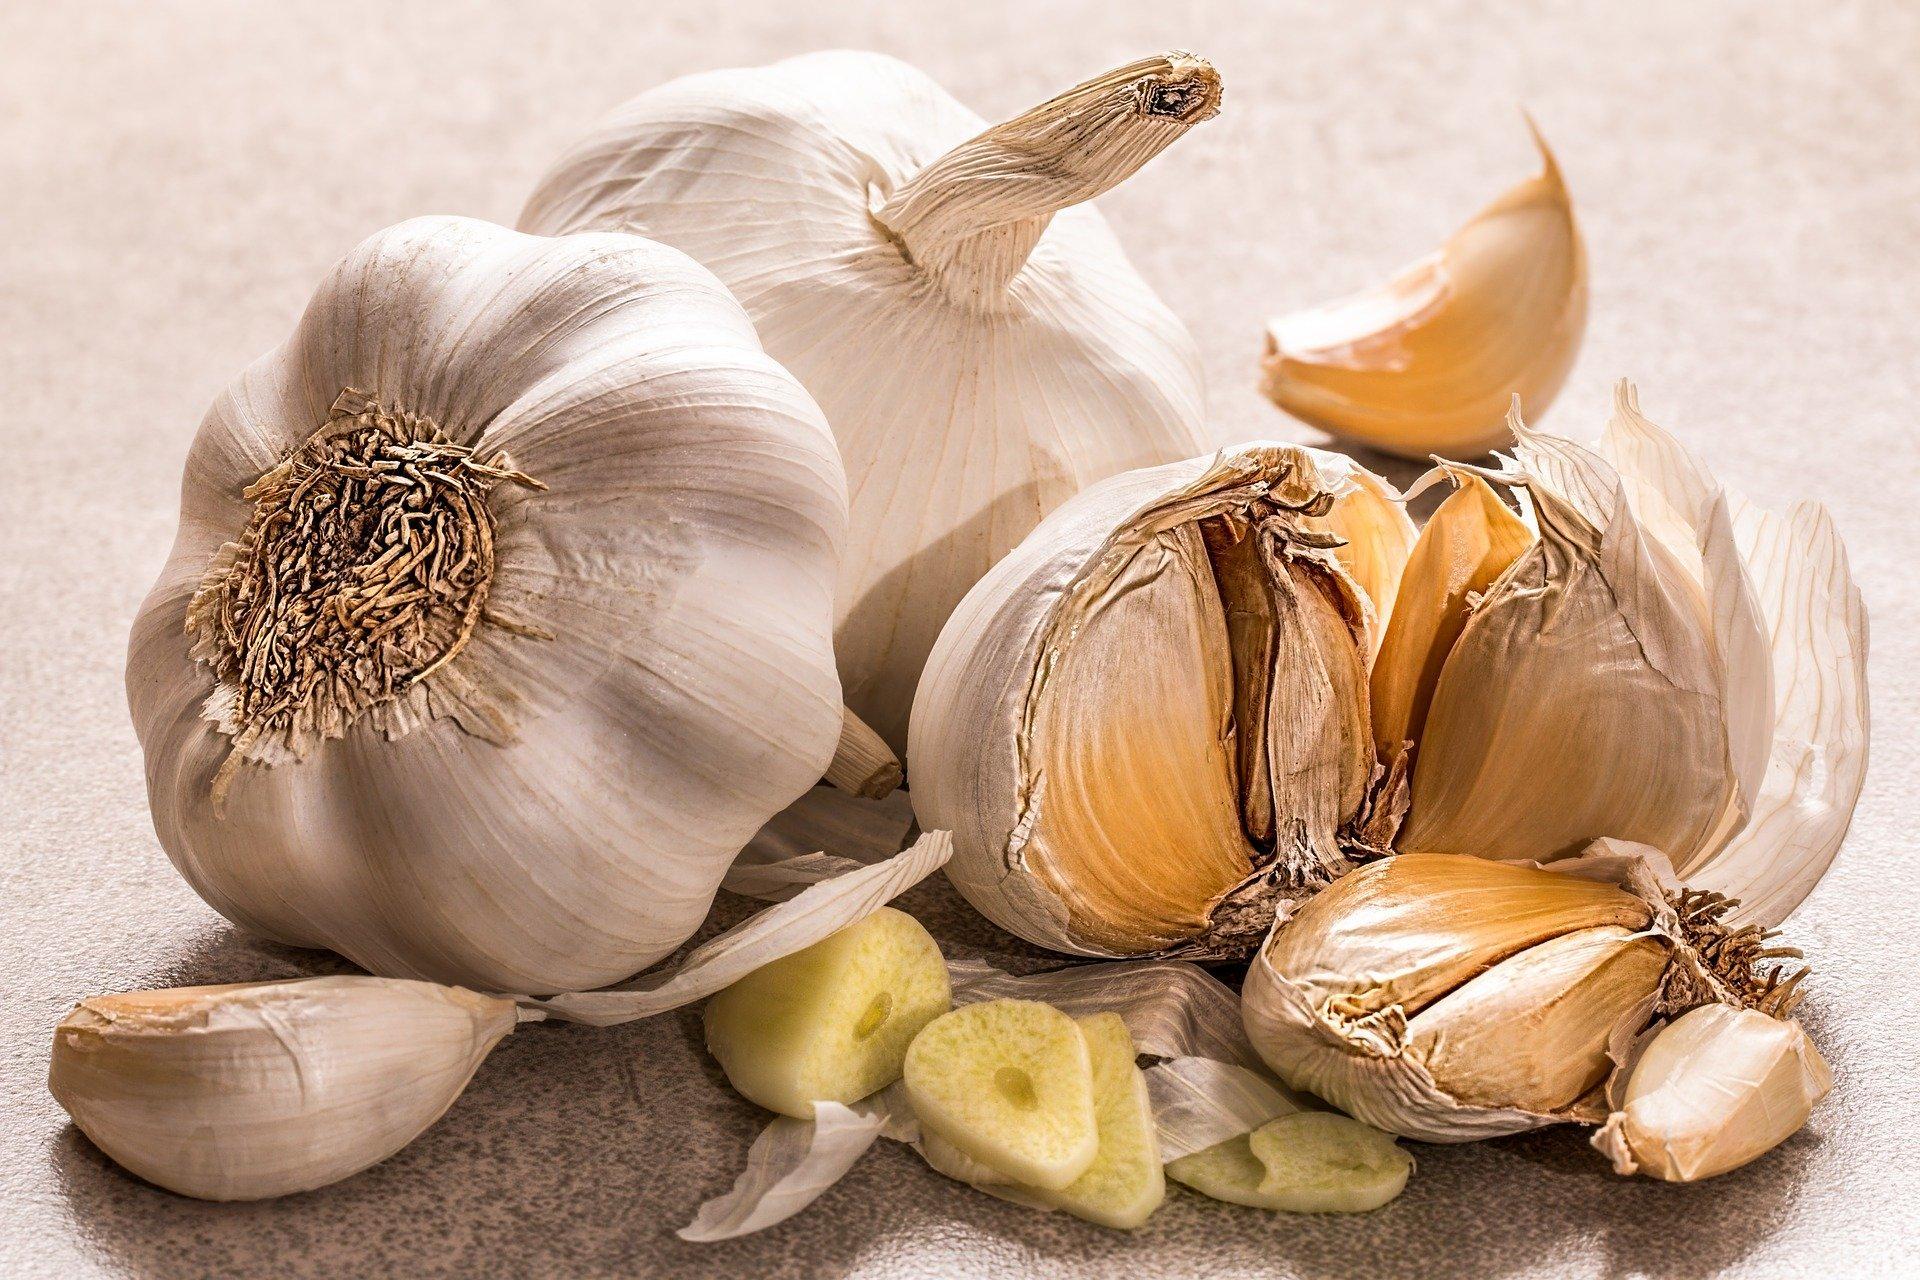 garlic 3419544 1920 1584538619219